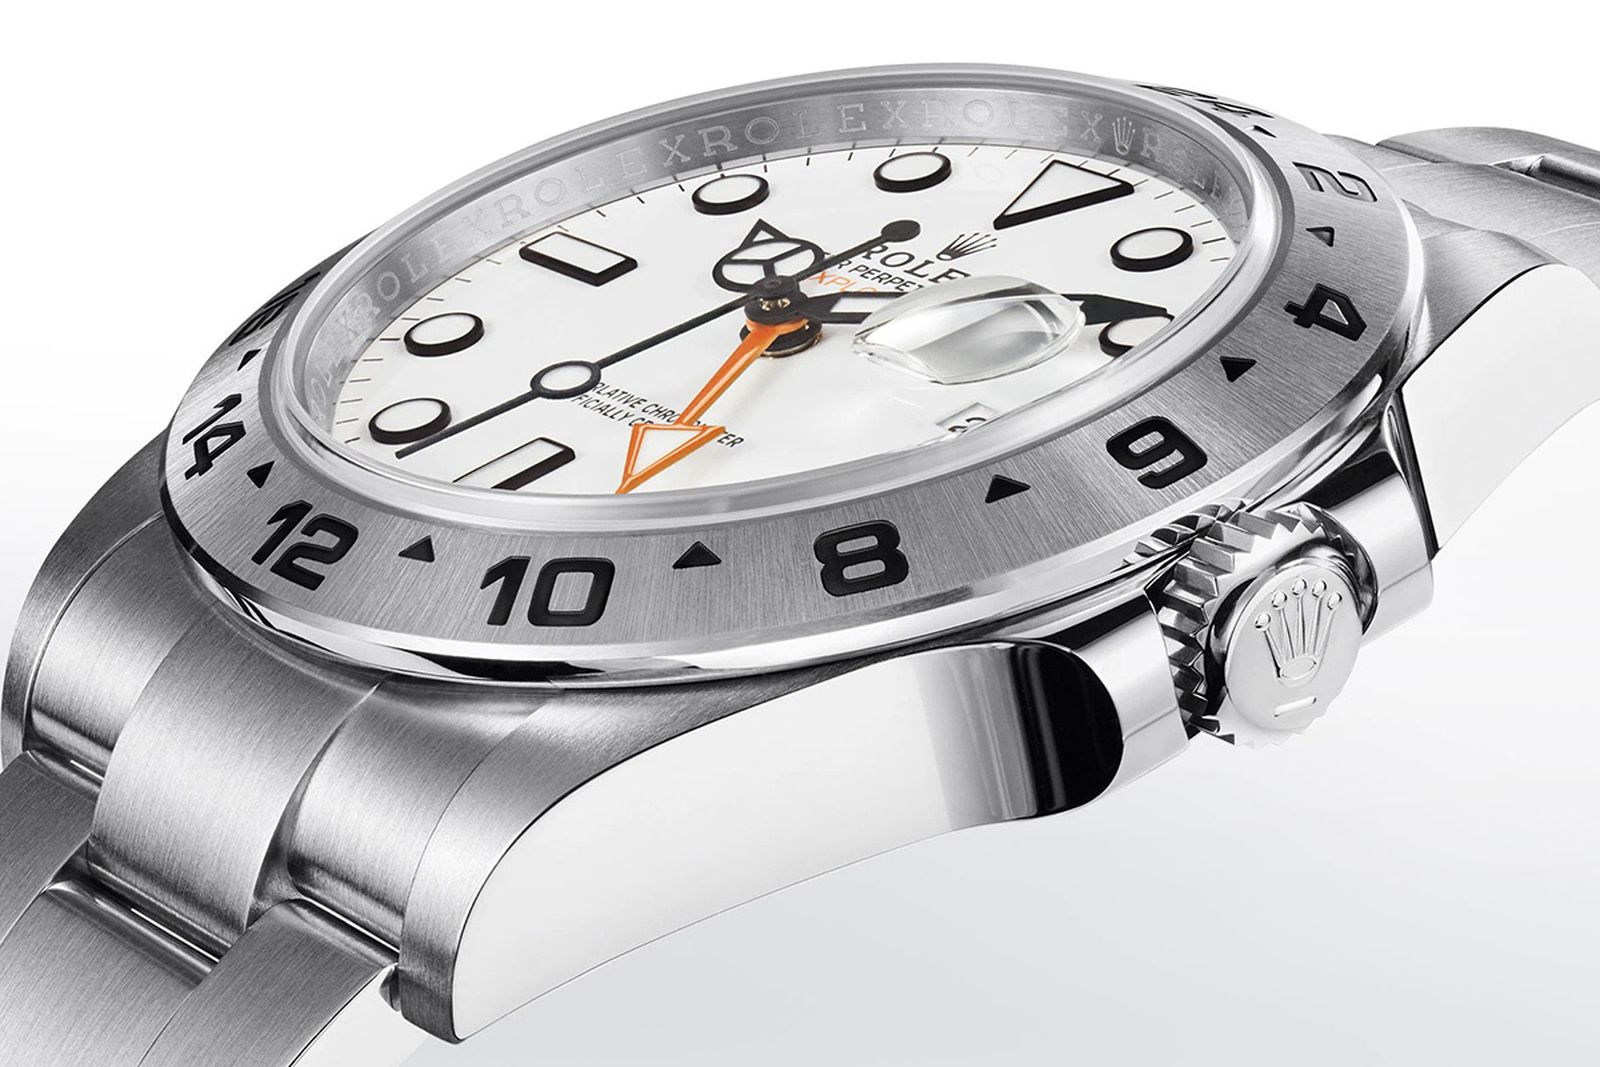 new-watches-2021-explorer-ii-intro-main